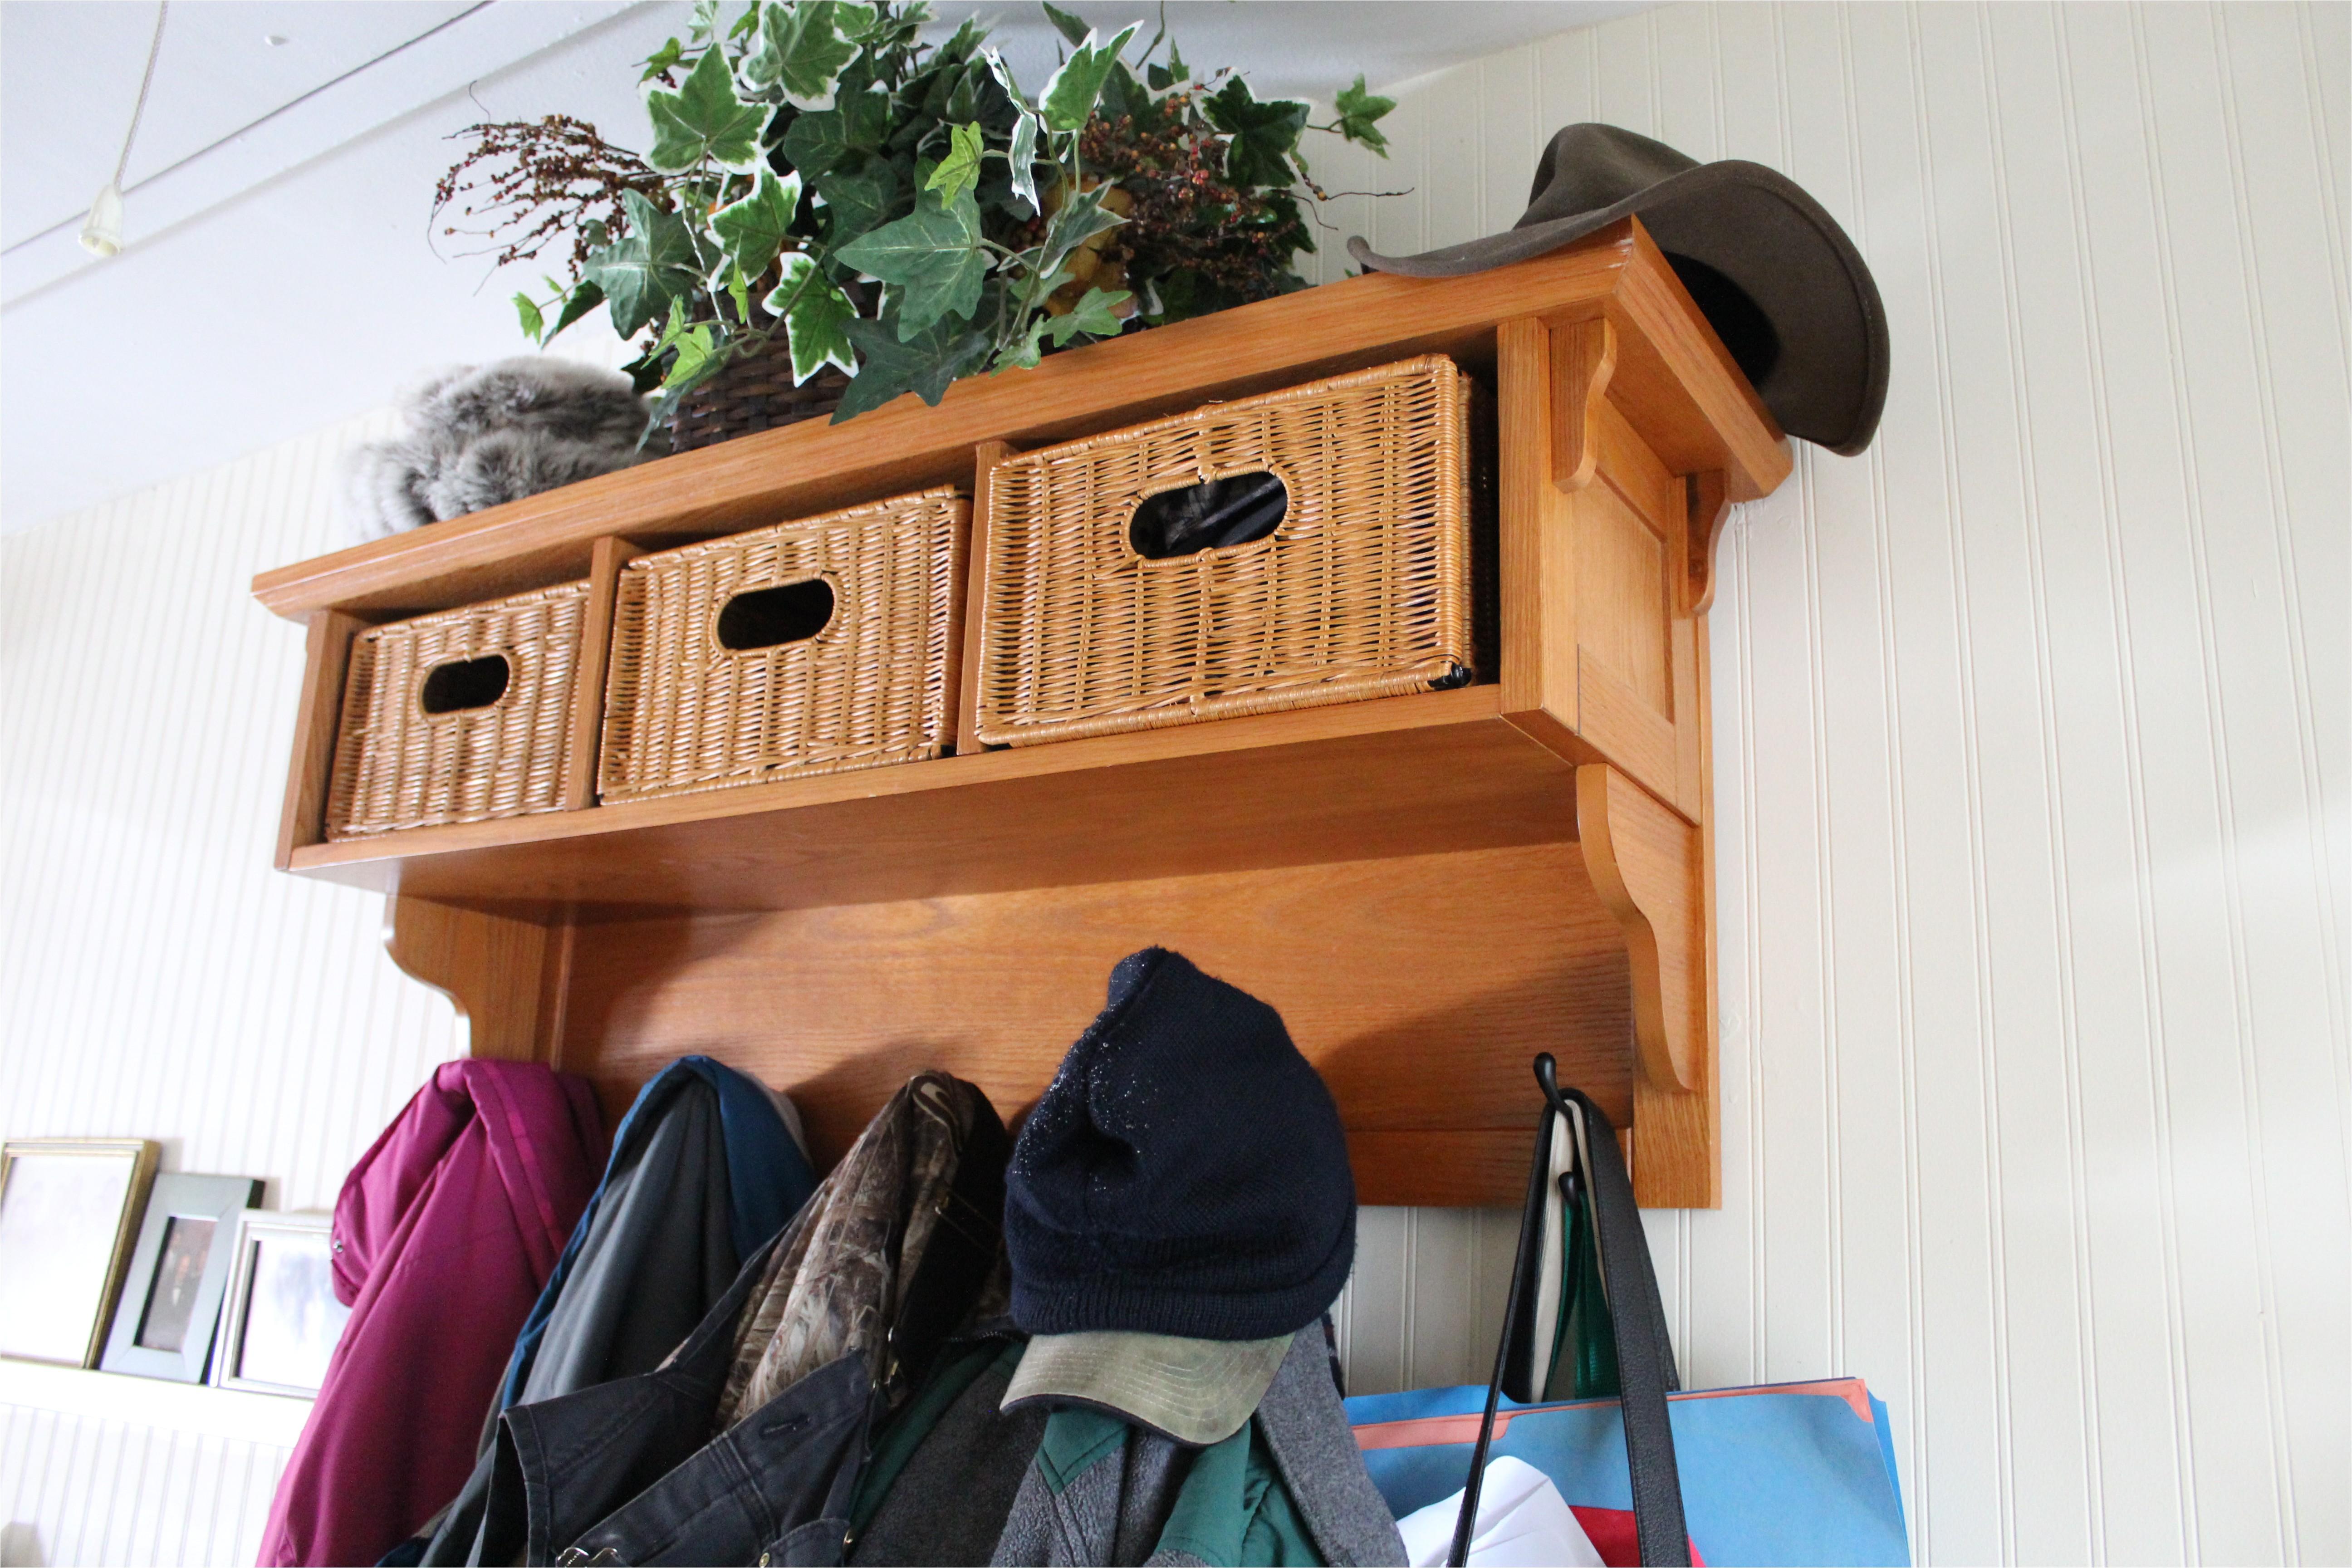 zwvimznj kitchen corner bench plans home improvement